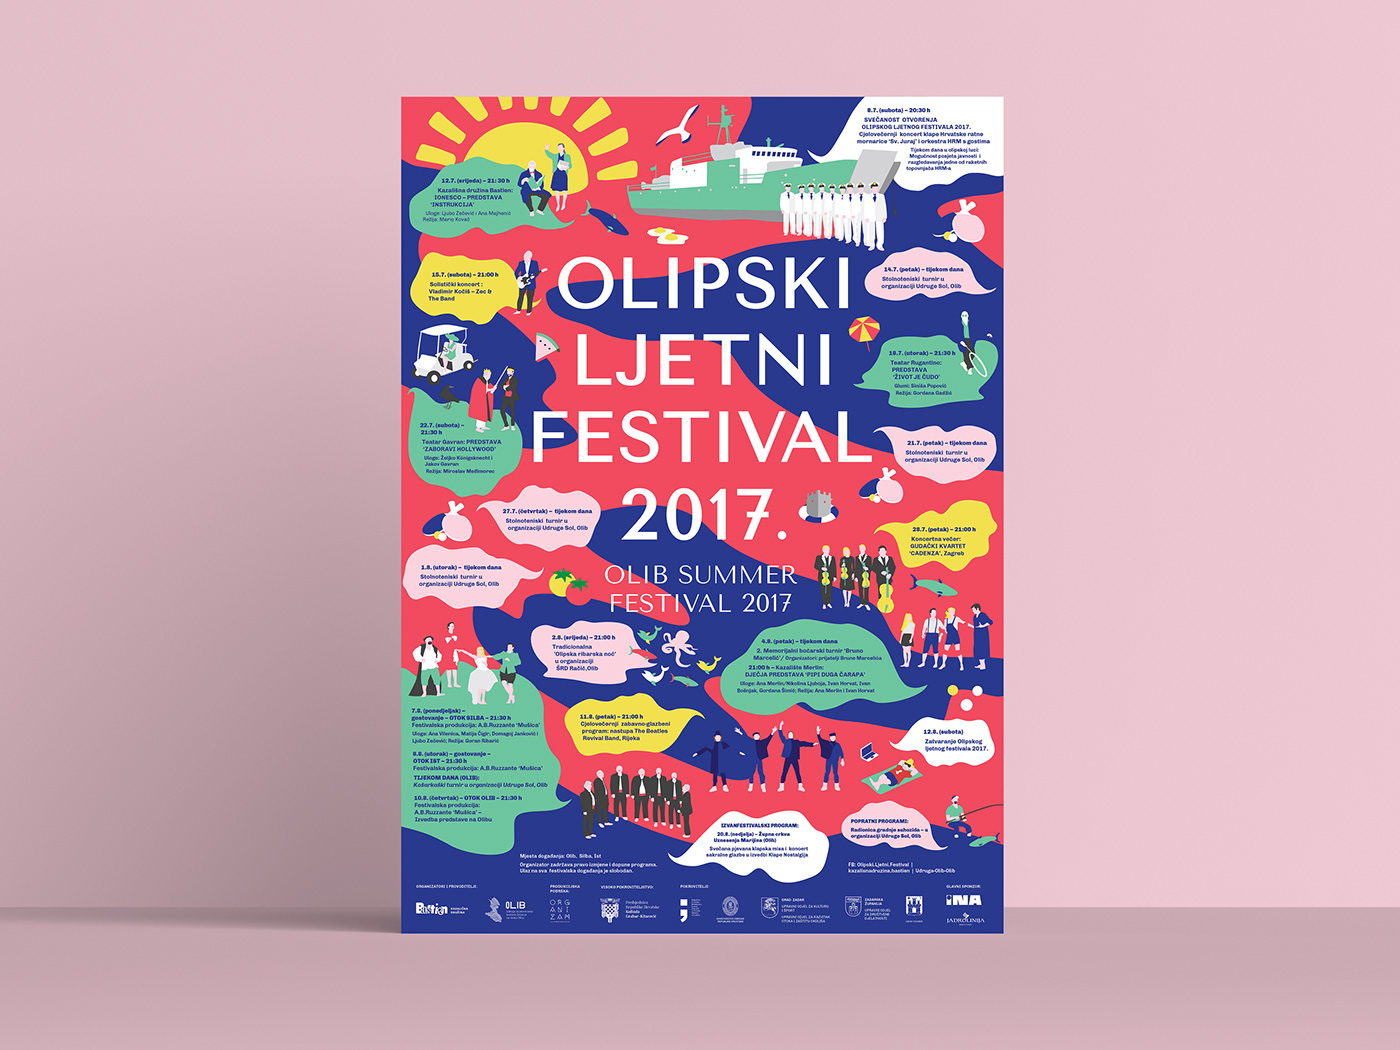 visual identity,Summer Festival,ILLUSTRATION ,Croatia,flippantly,Island,Performance